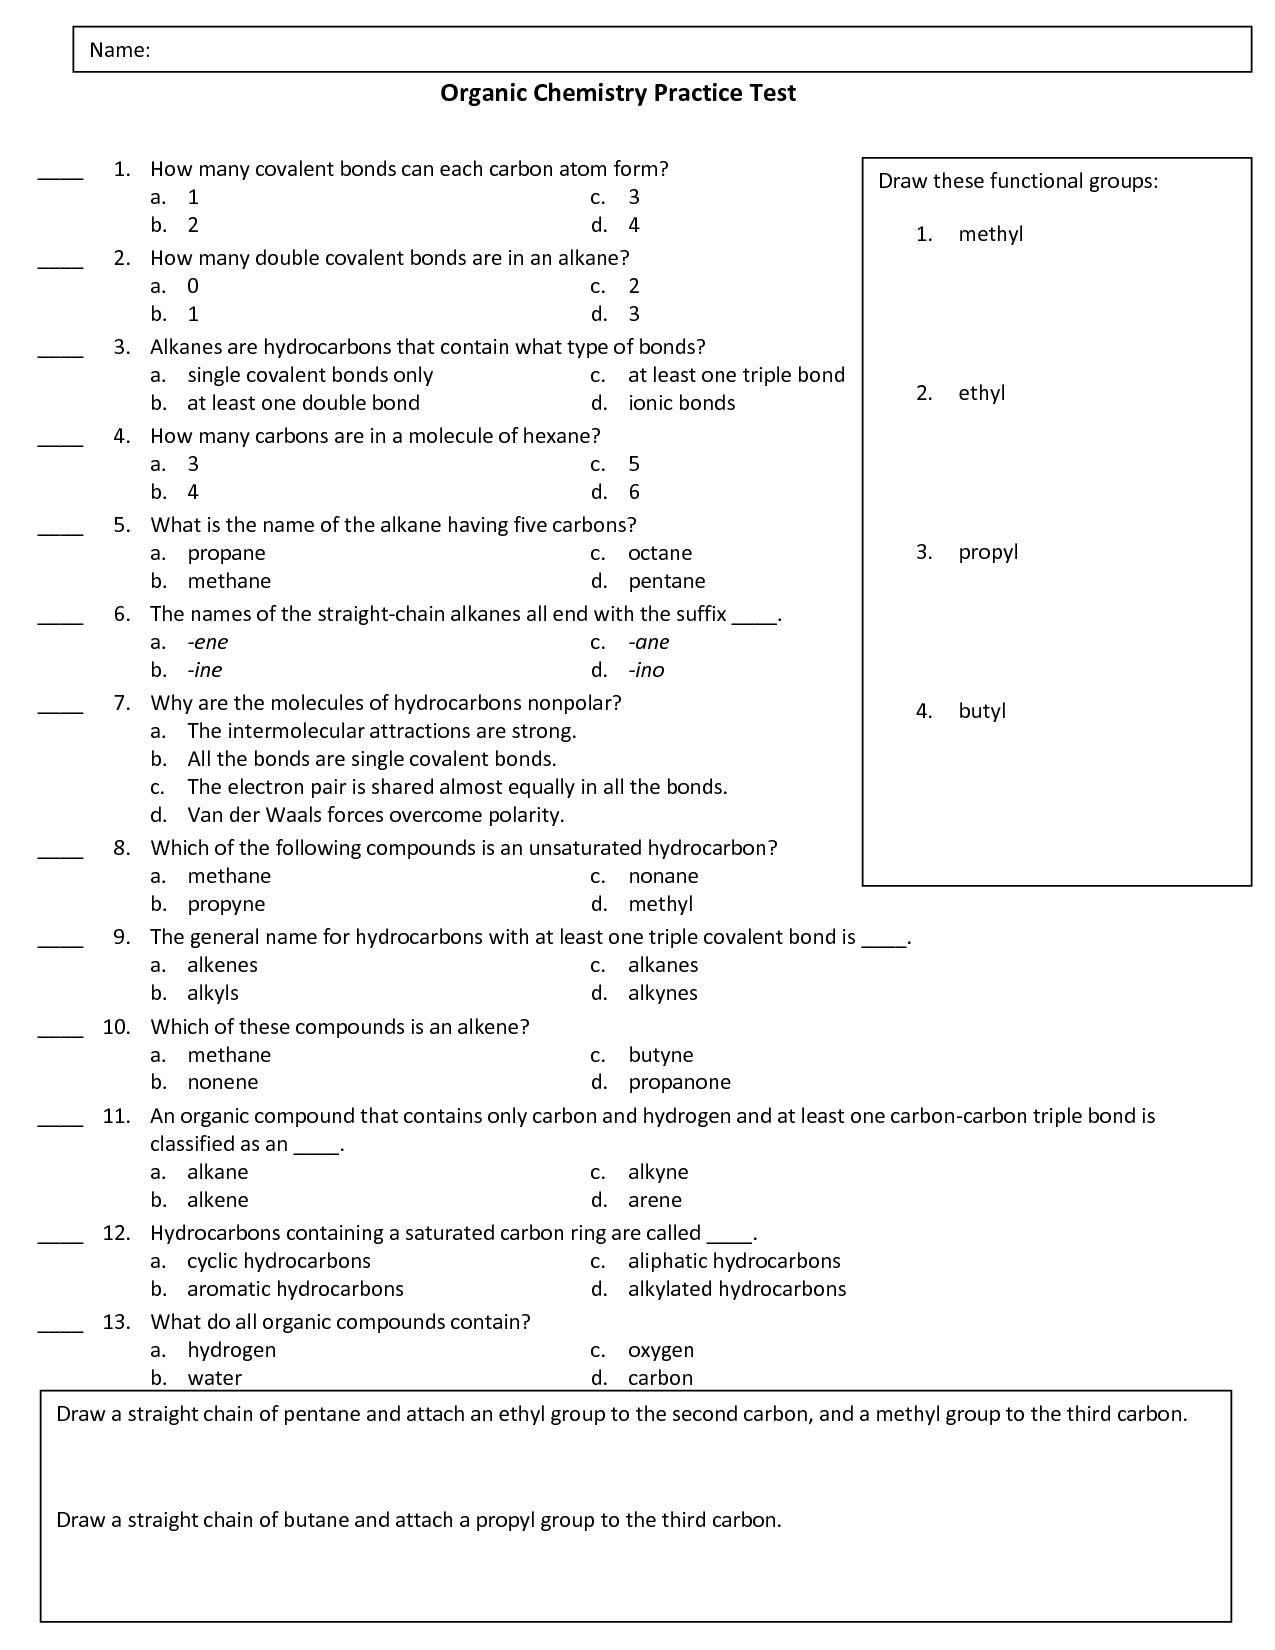 Organic Chemistry Infographic